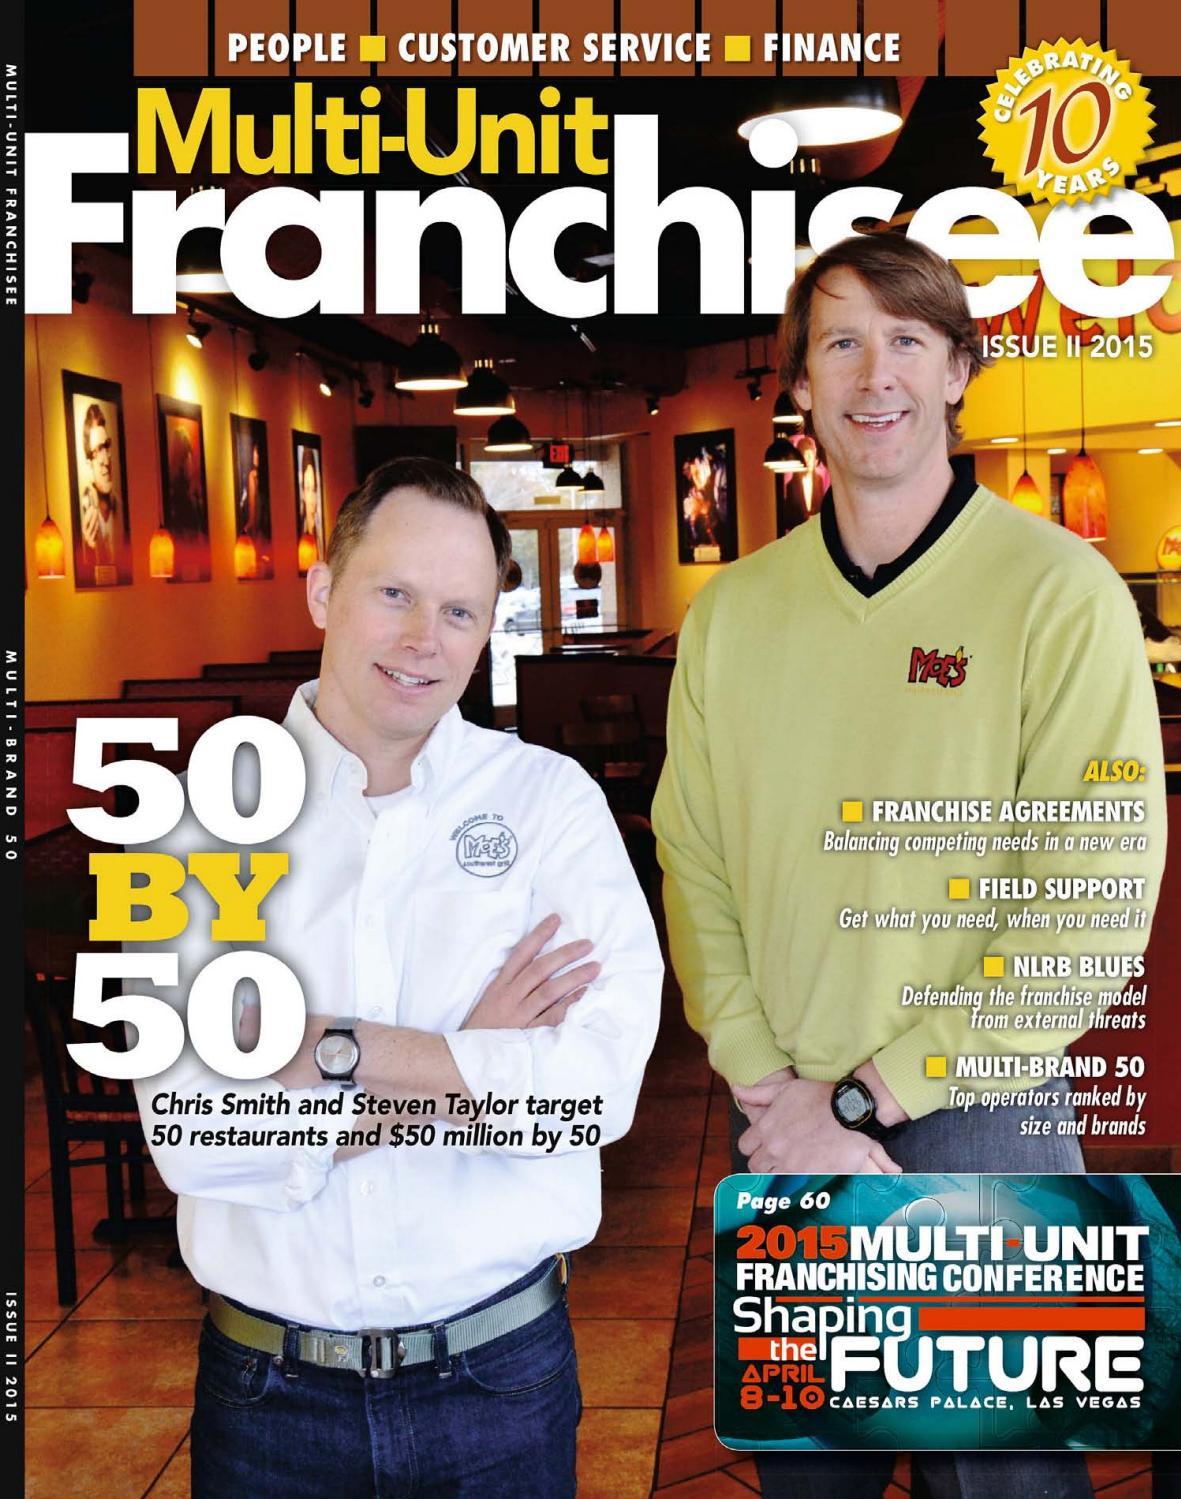 Multi-Unit Franchisee Magazine - Issue II b418251ac8a2